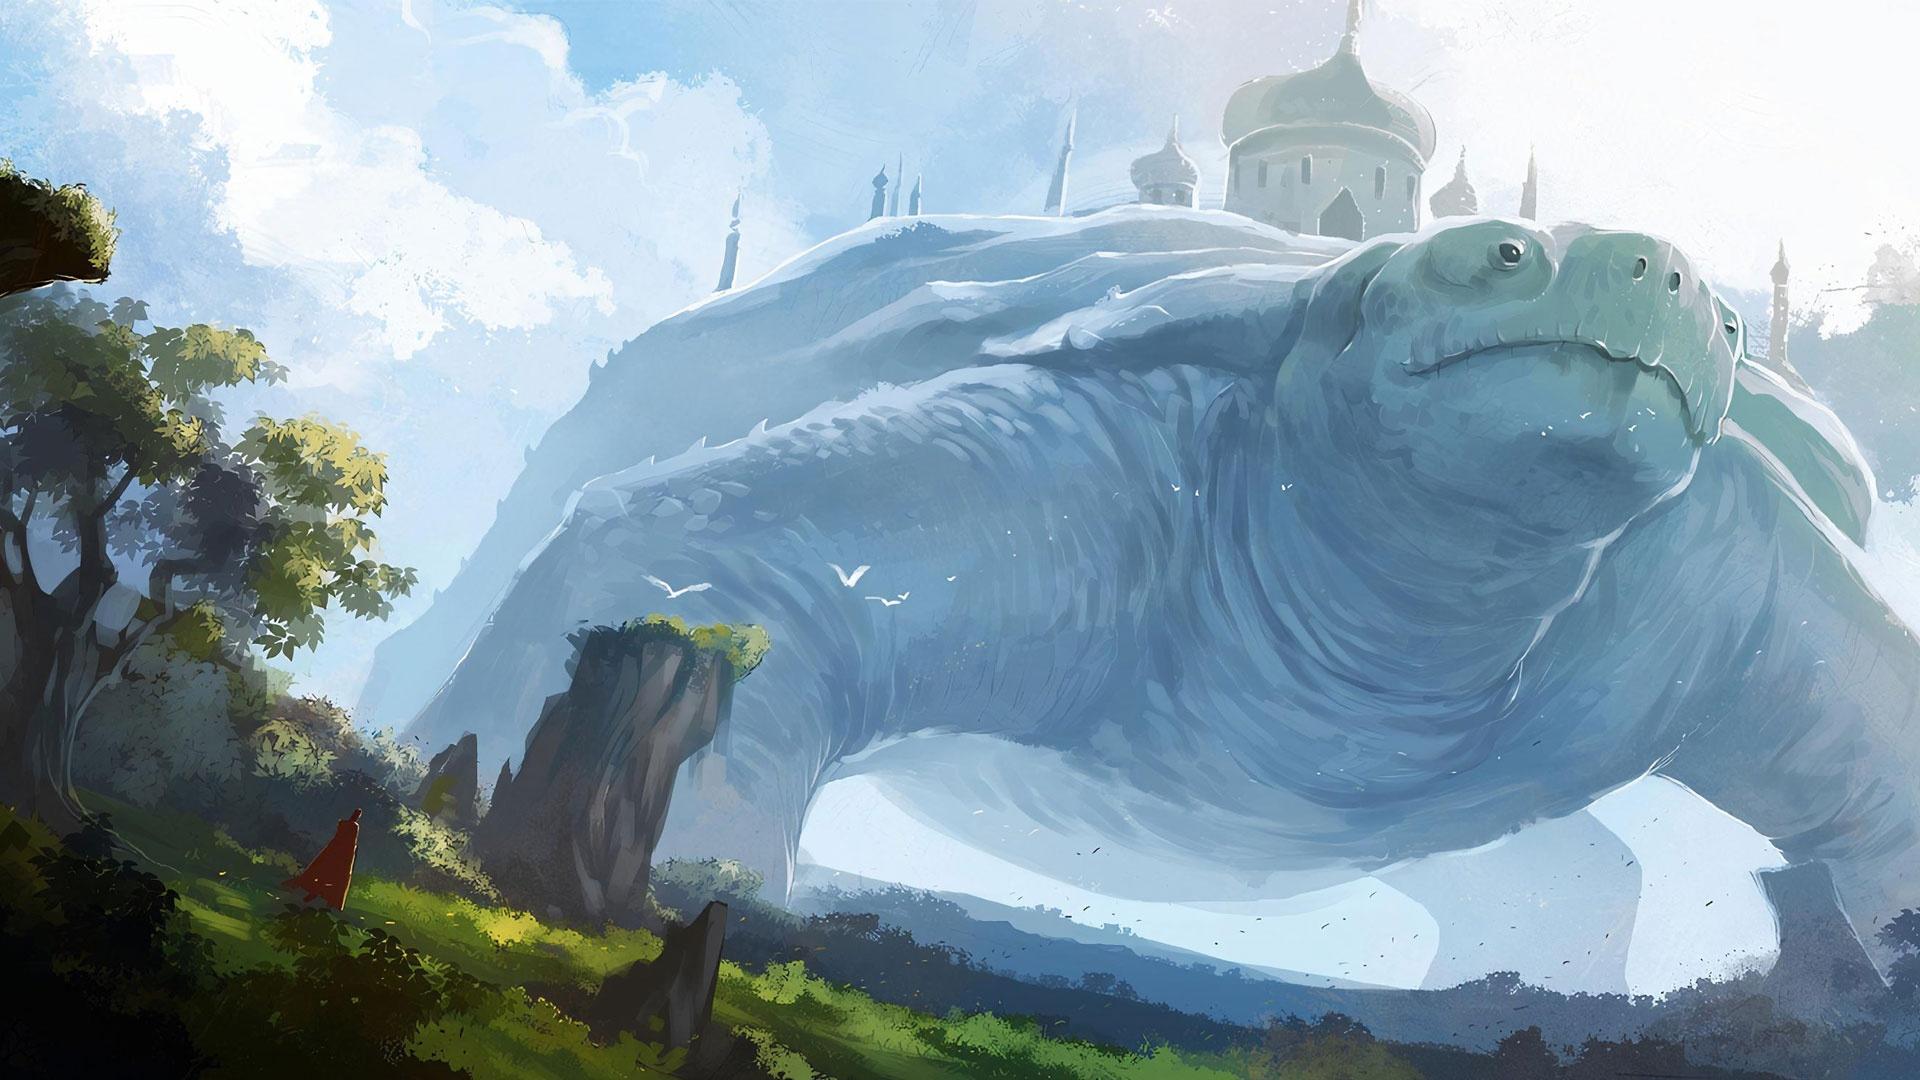 Giant Art hd background